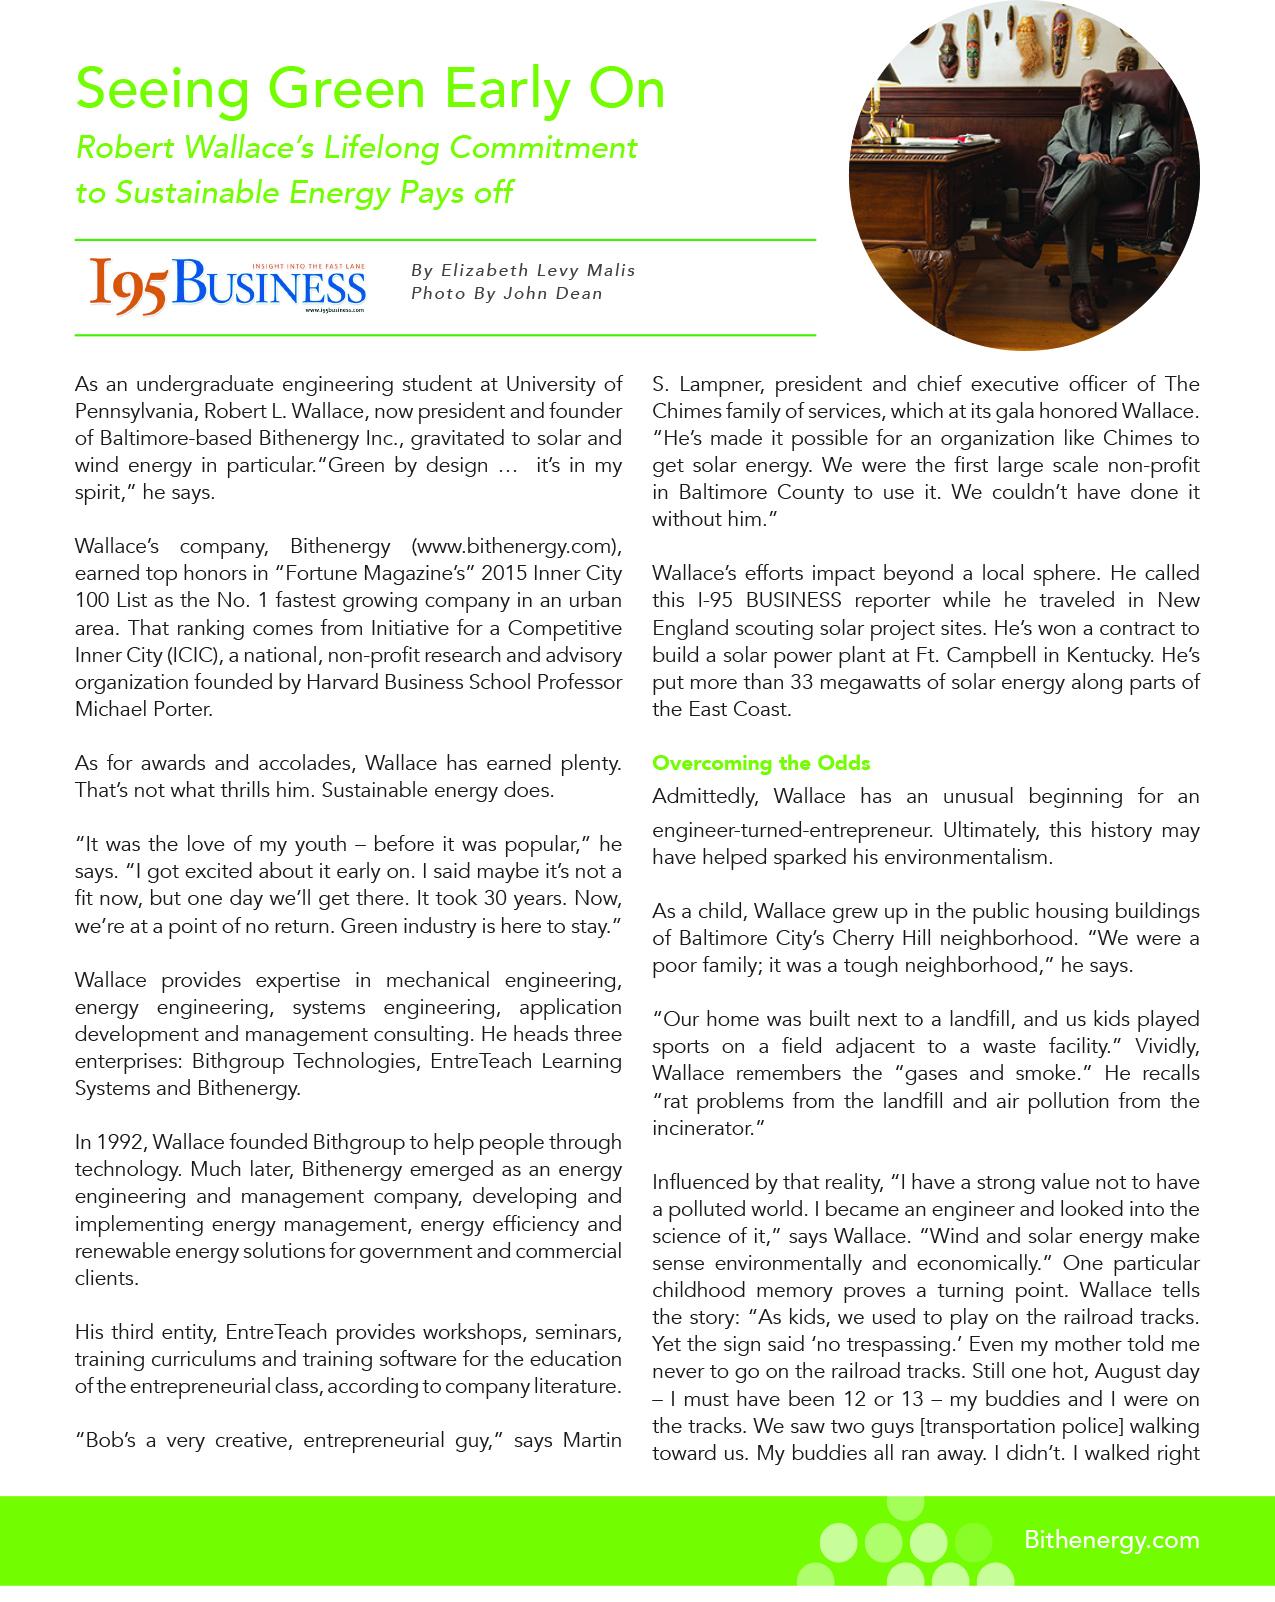 2016 06_SeeingGreen_I95Business_Article-1.jpg